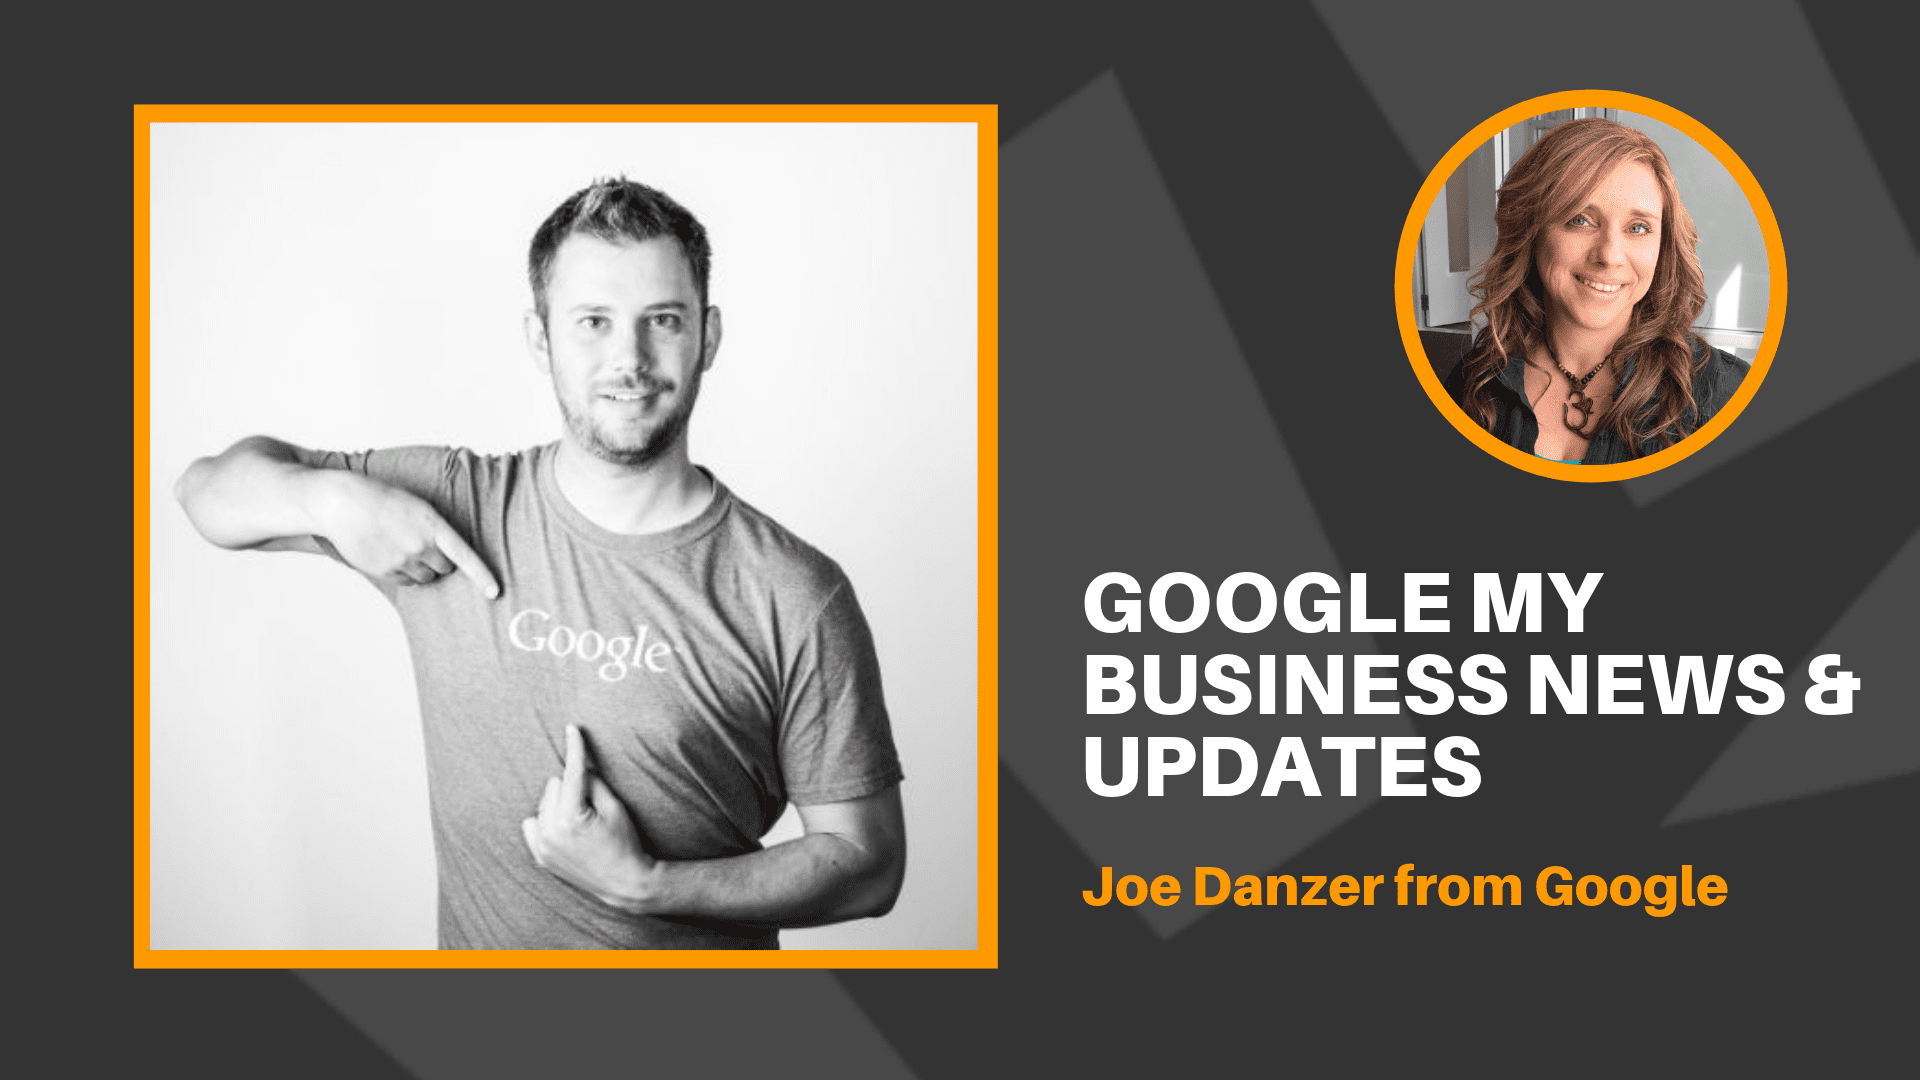 Google My Business, Google Updates